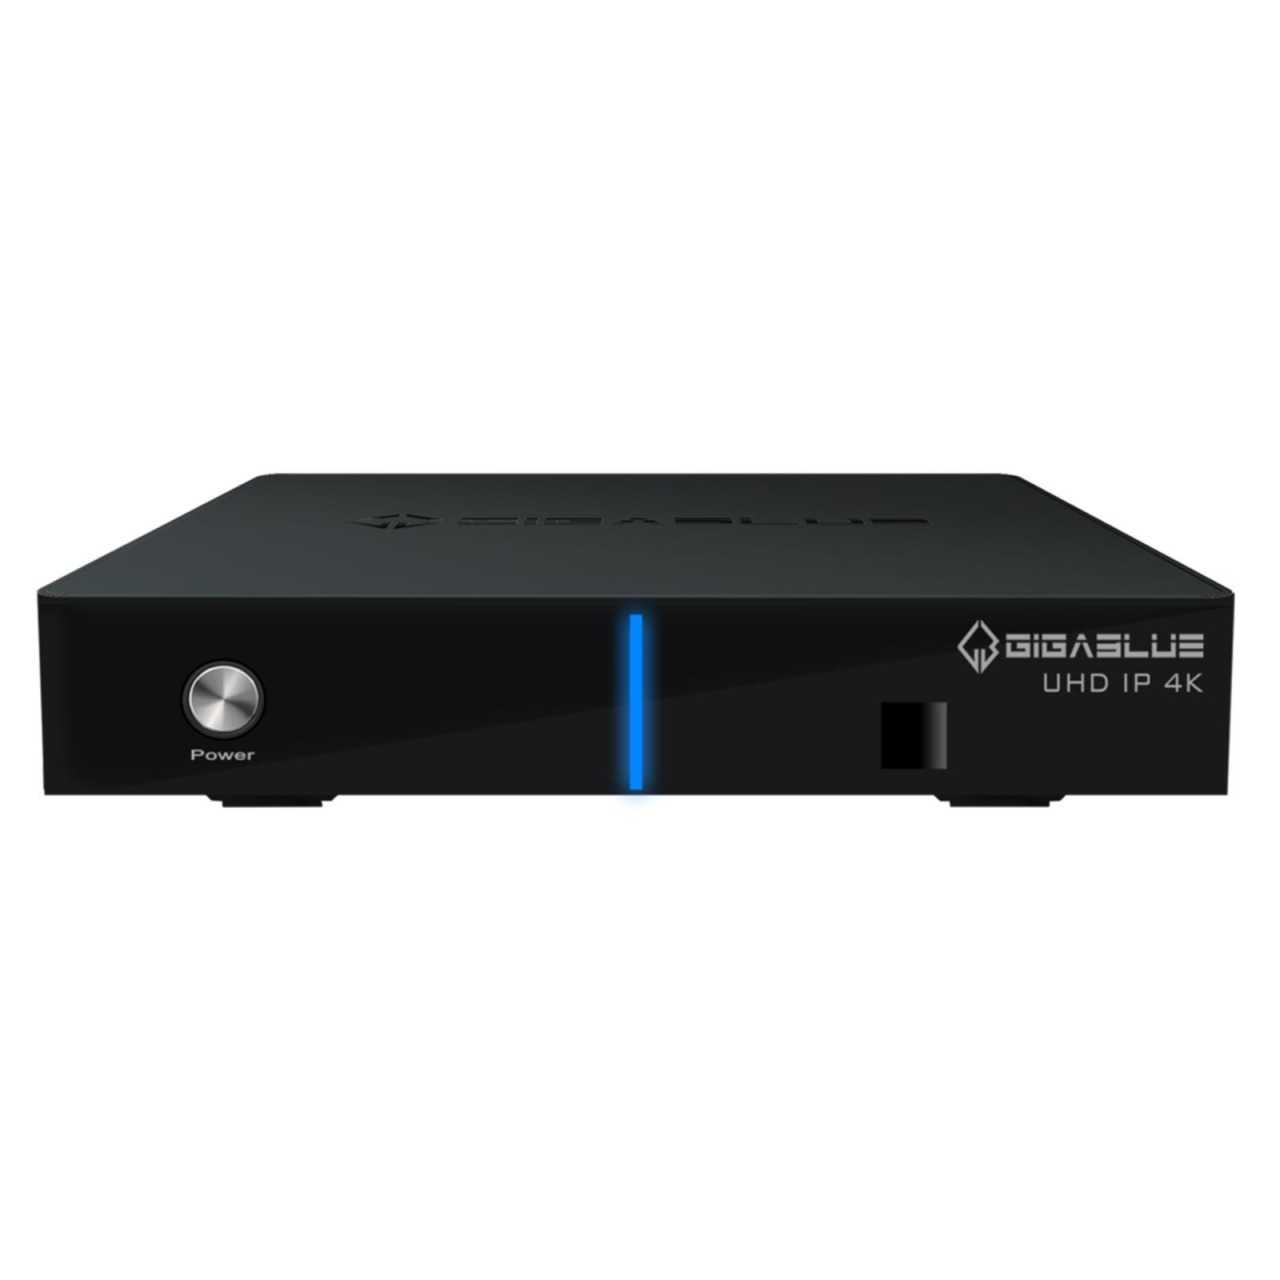 GigaBlue UHD IP 4K USB HDMI SD Karte 1x DVB-C/T2 Dual Tuner H.265 Multiroom Receiver Schwarz RECGIG044